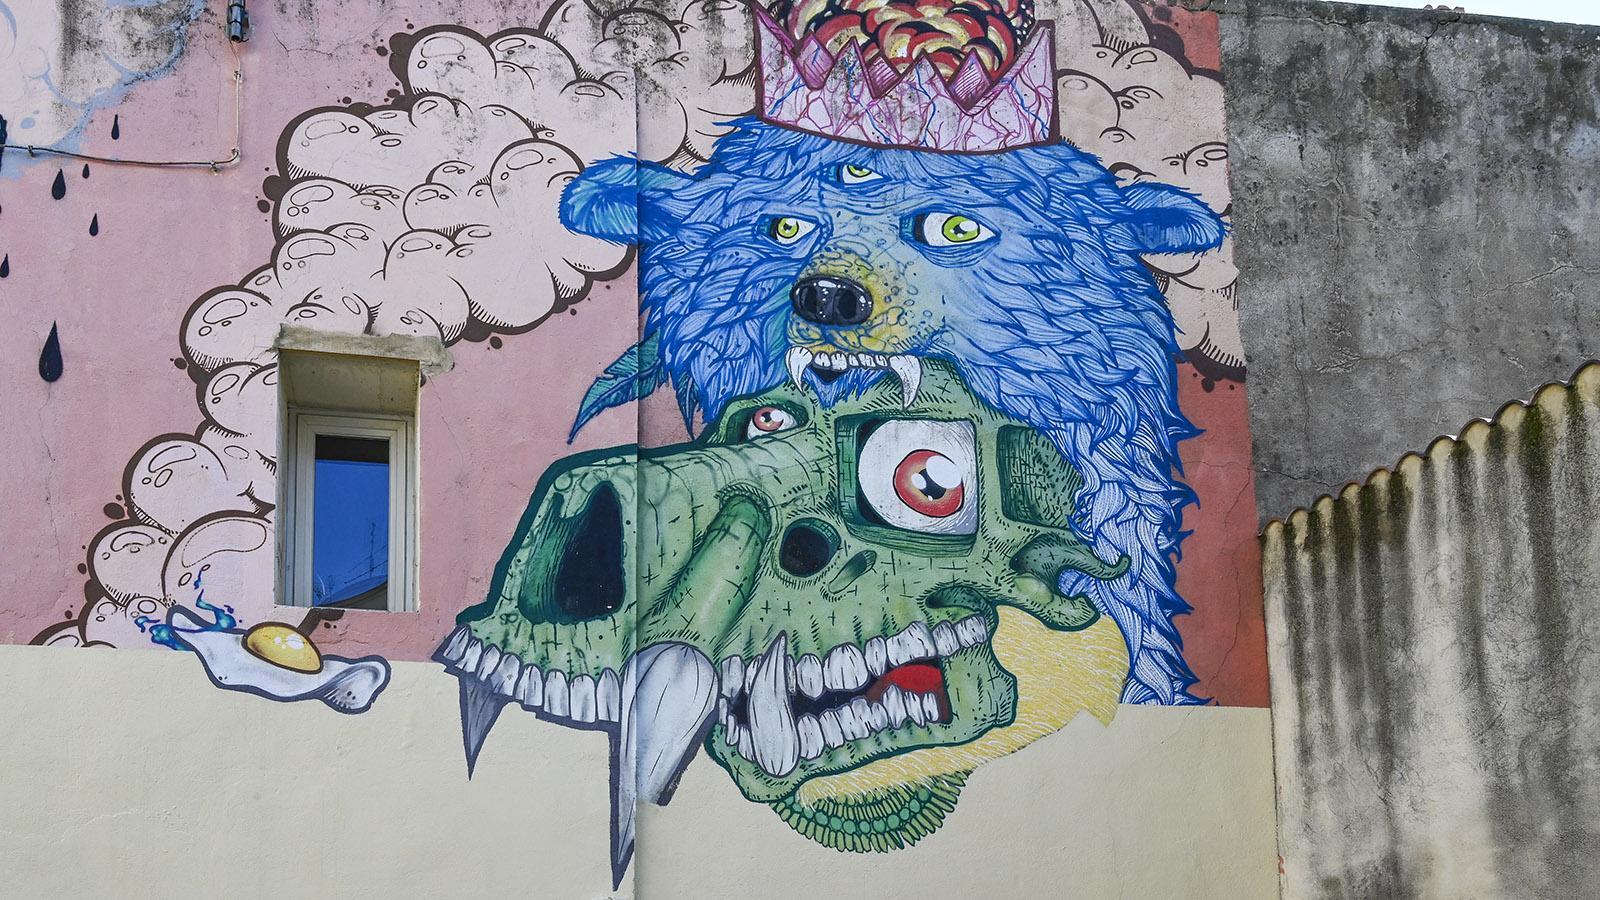 Streeet Art Nîmes, Richelieu: Hazo. Foto: Hilke Maunder